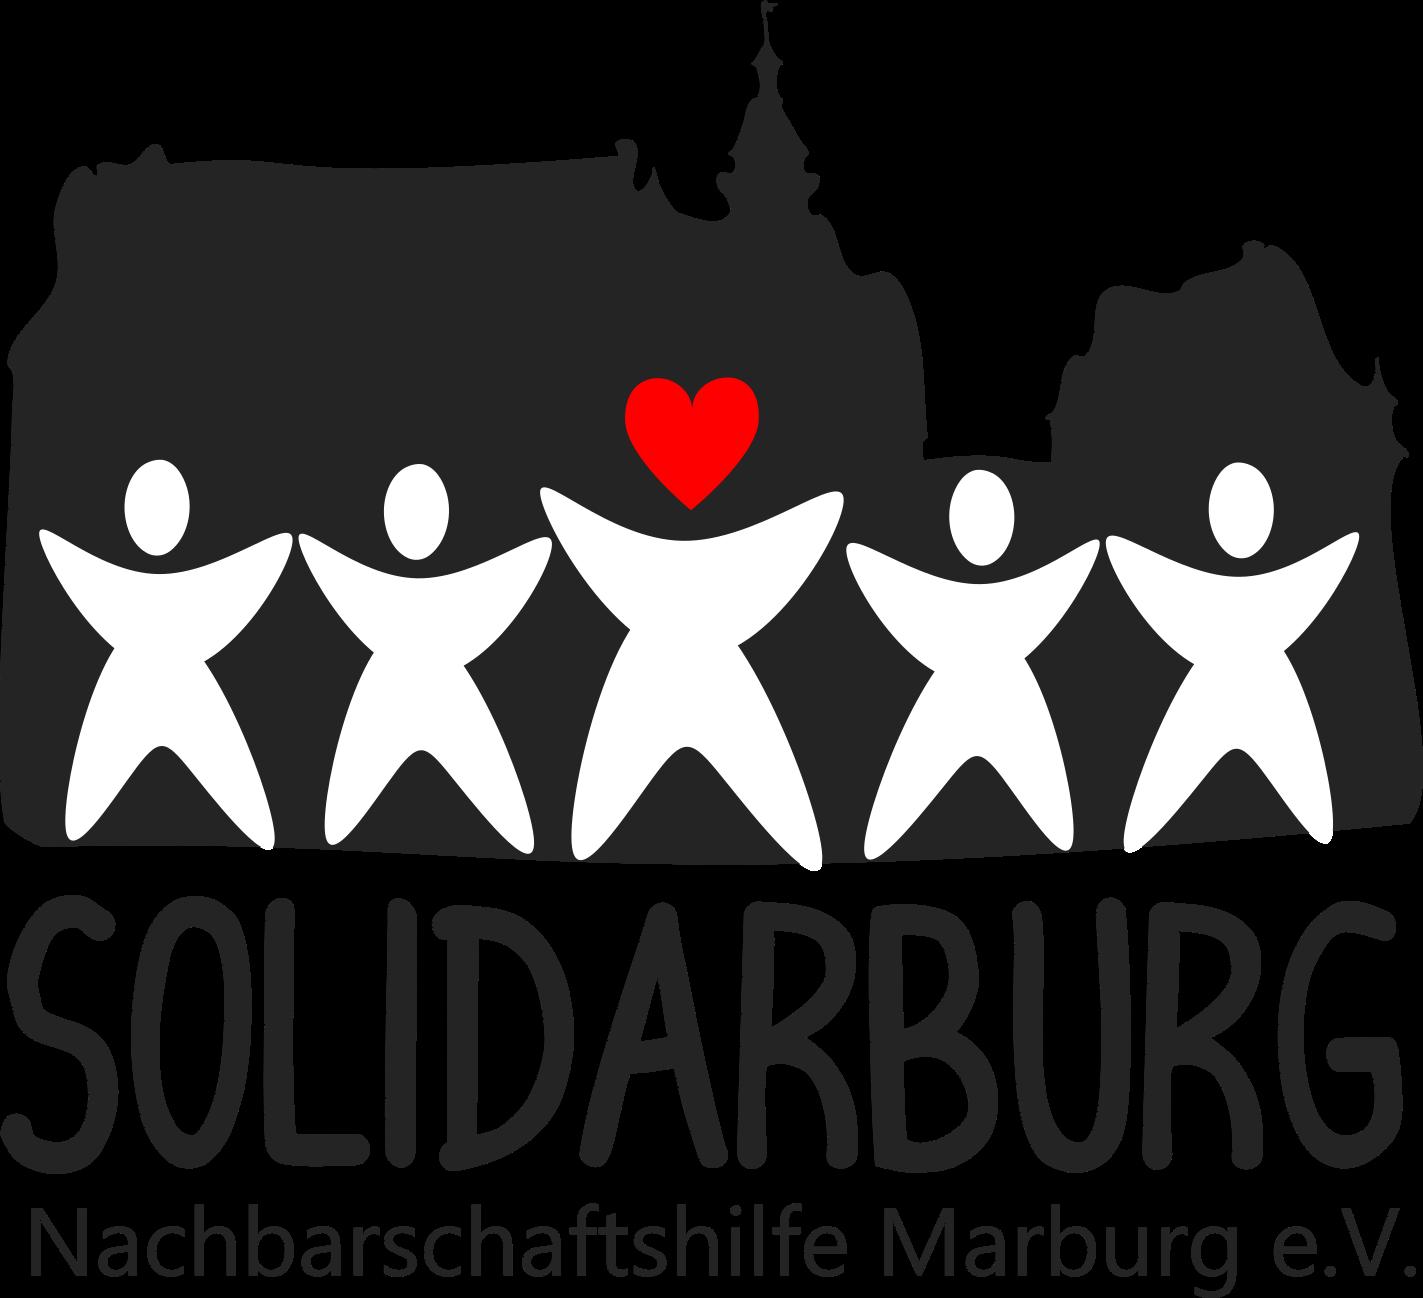 Solidarburg